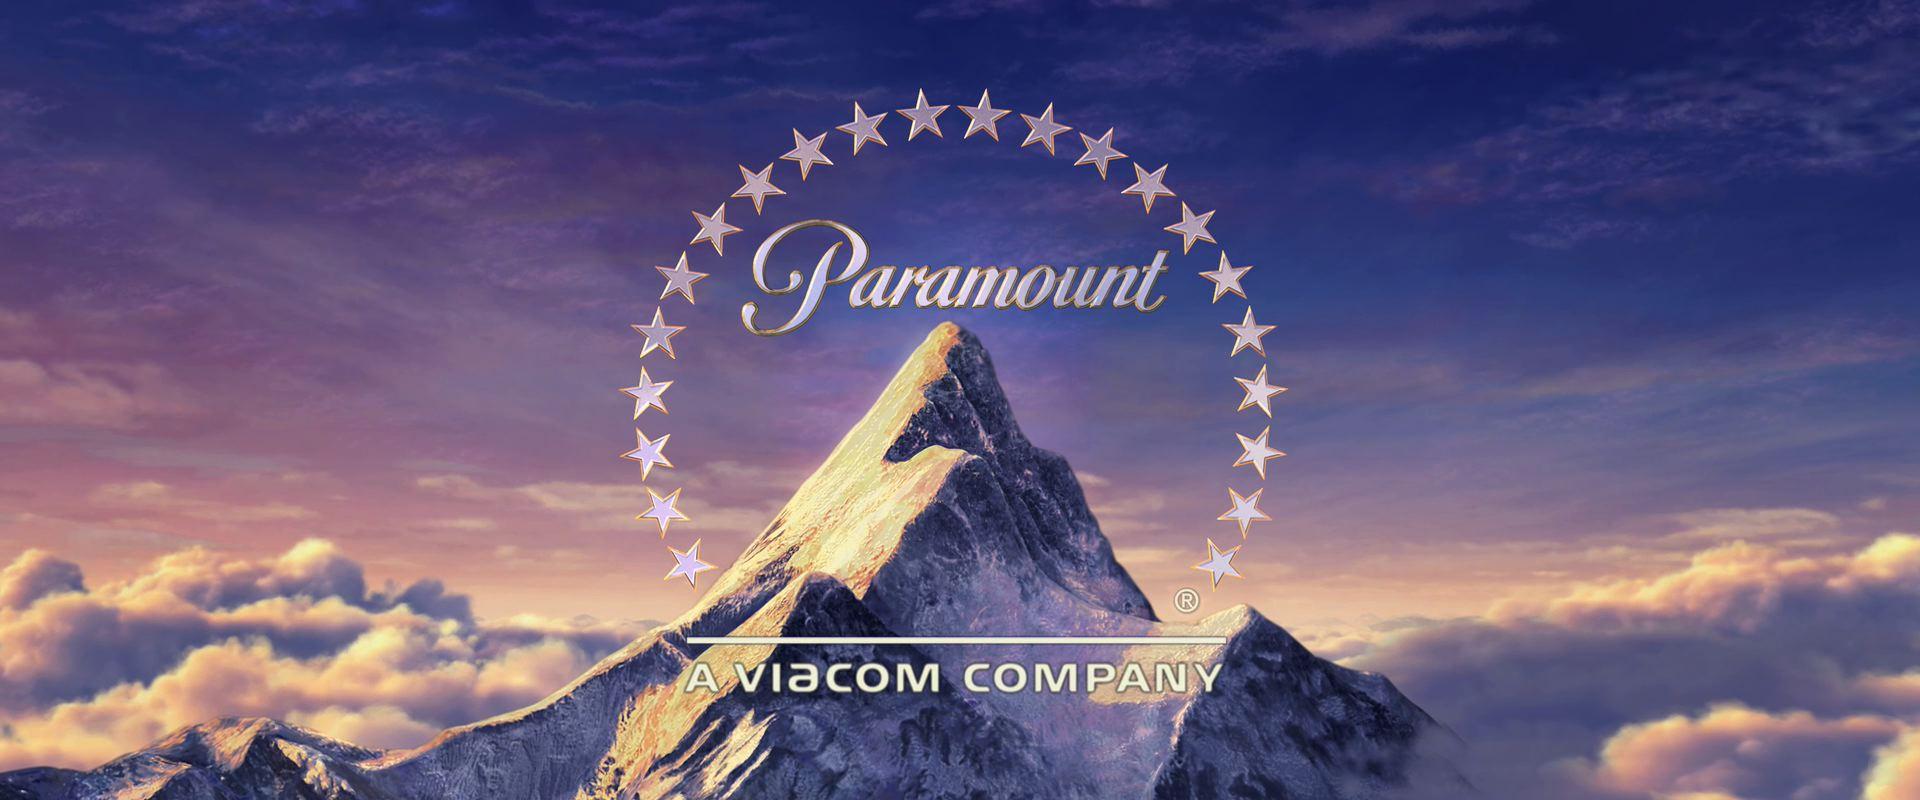 paramount logo2.jpg